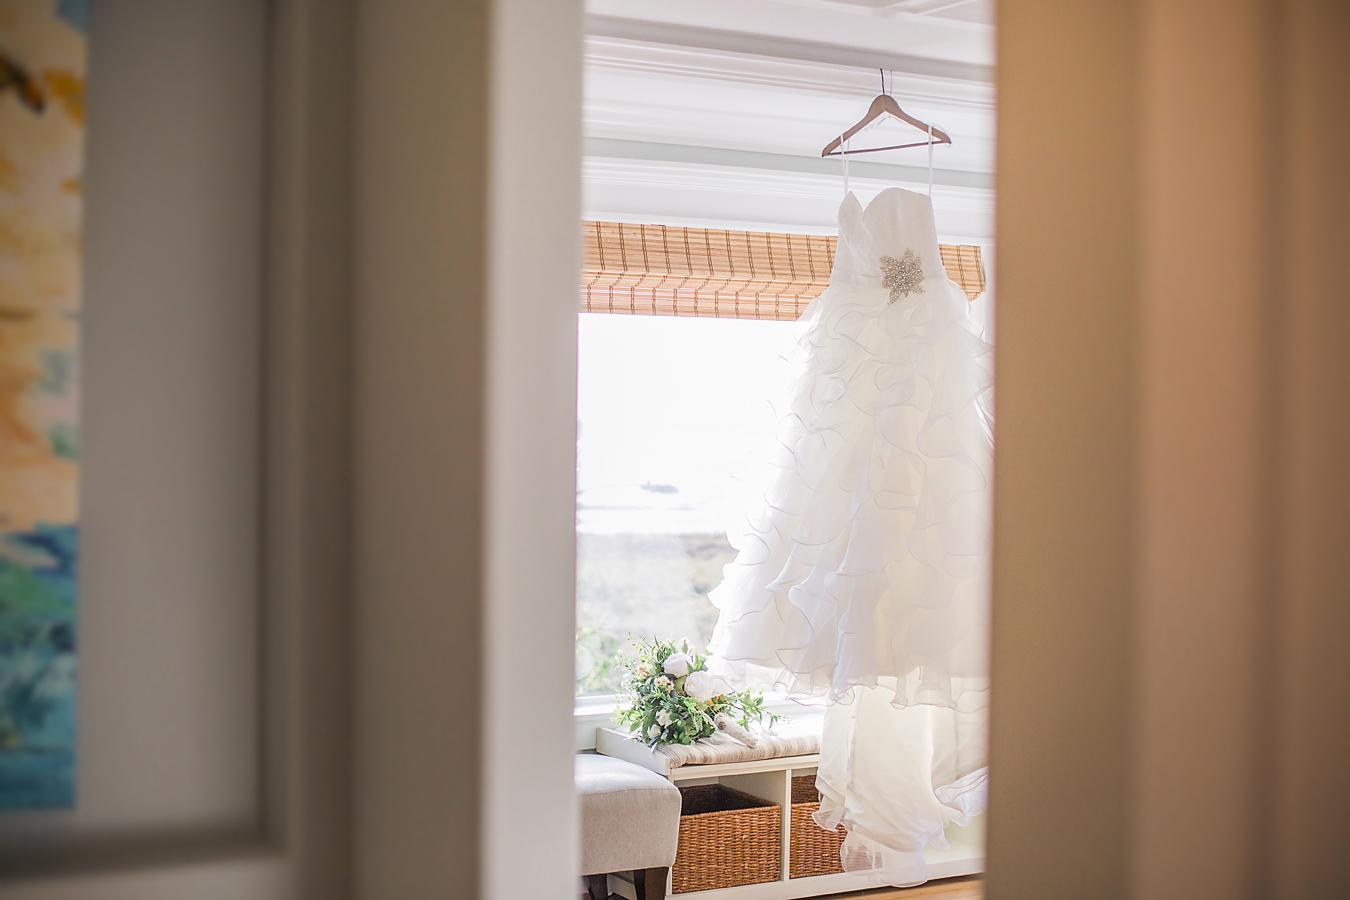 Bailey + Chalin - Anna Maria Island Wedding Photographer - Destination Wedding Photography - Emily & Co. Photography - Beach Wedding Photography (1).jpg